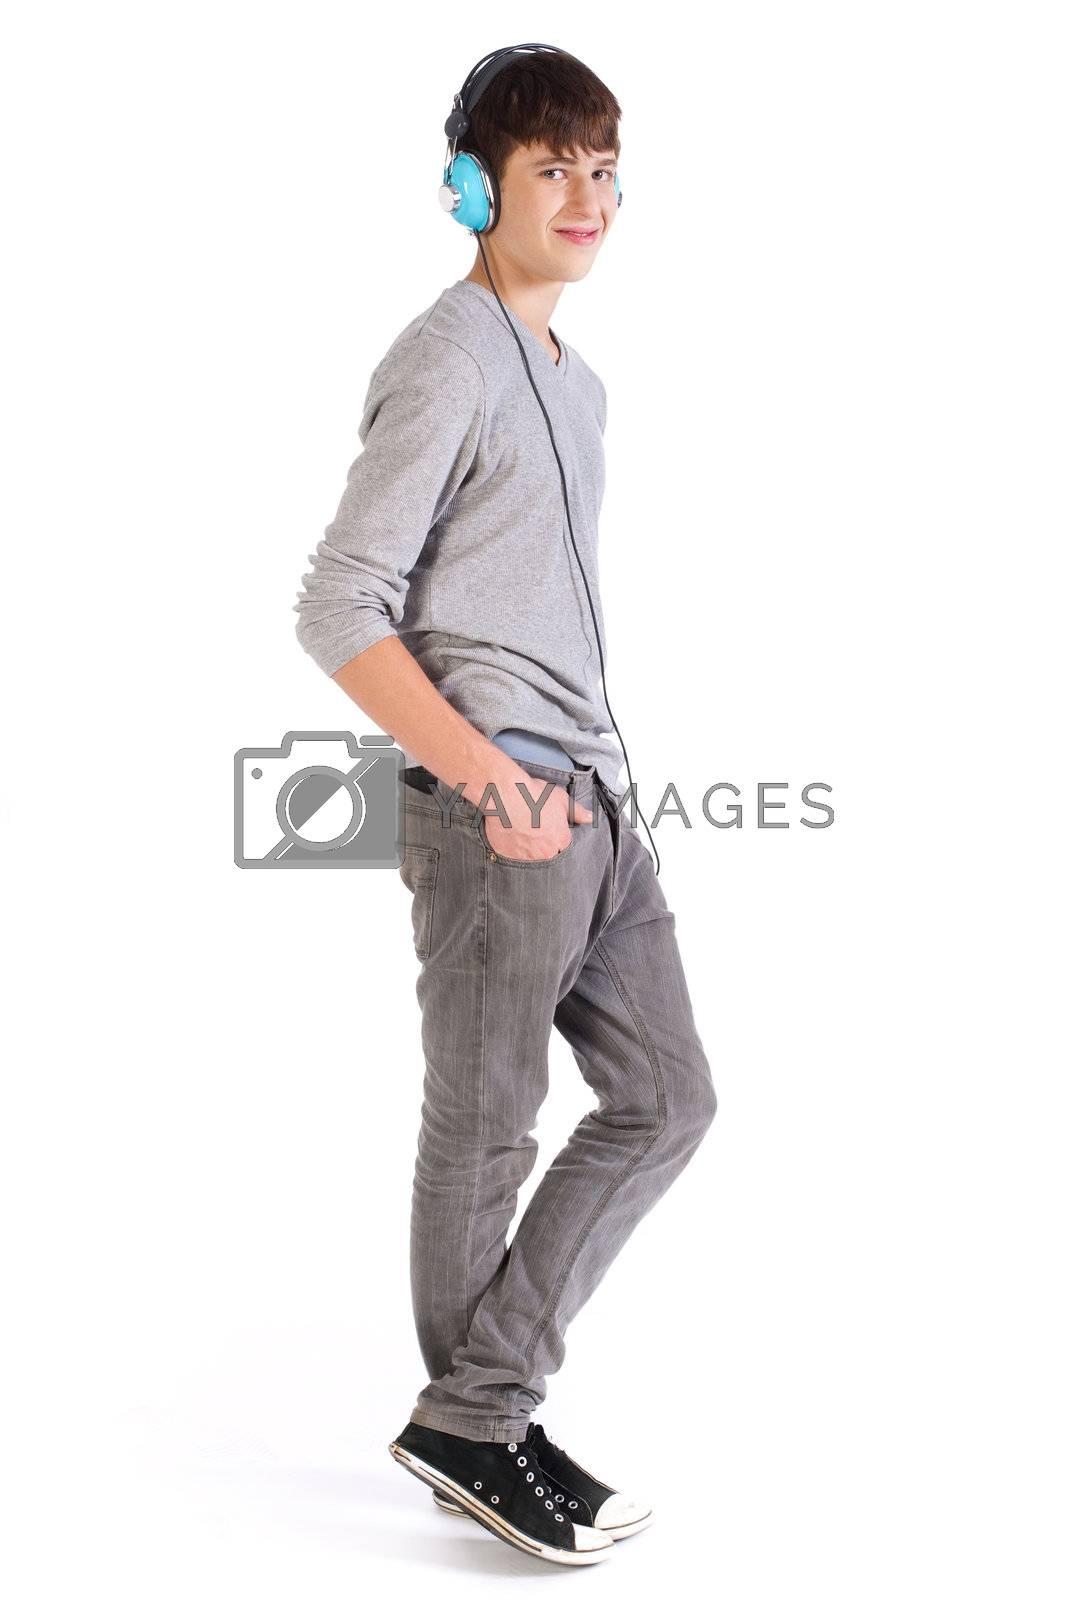 Teenager enjoying music and smiles, isolated on white background.